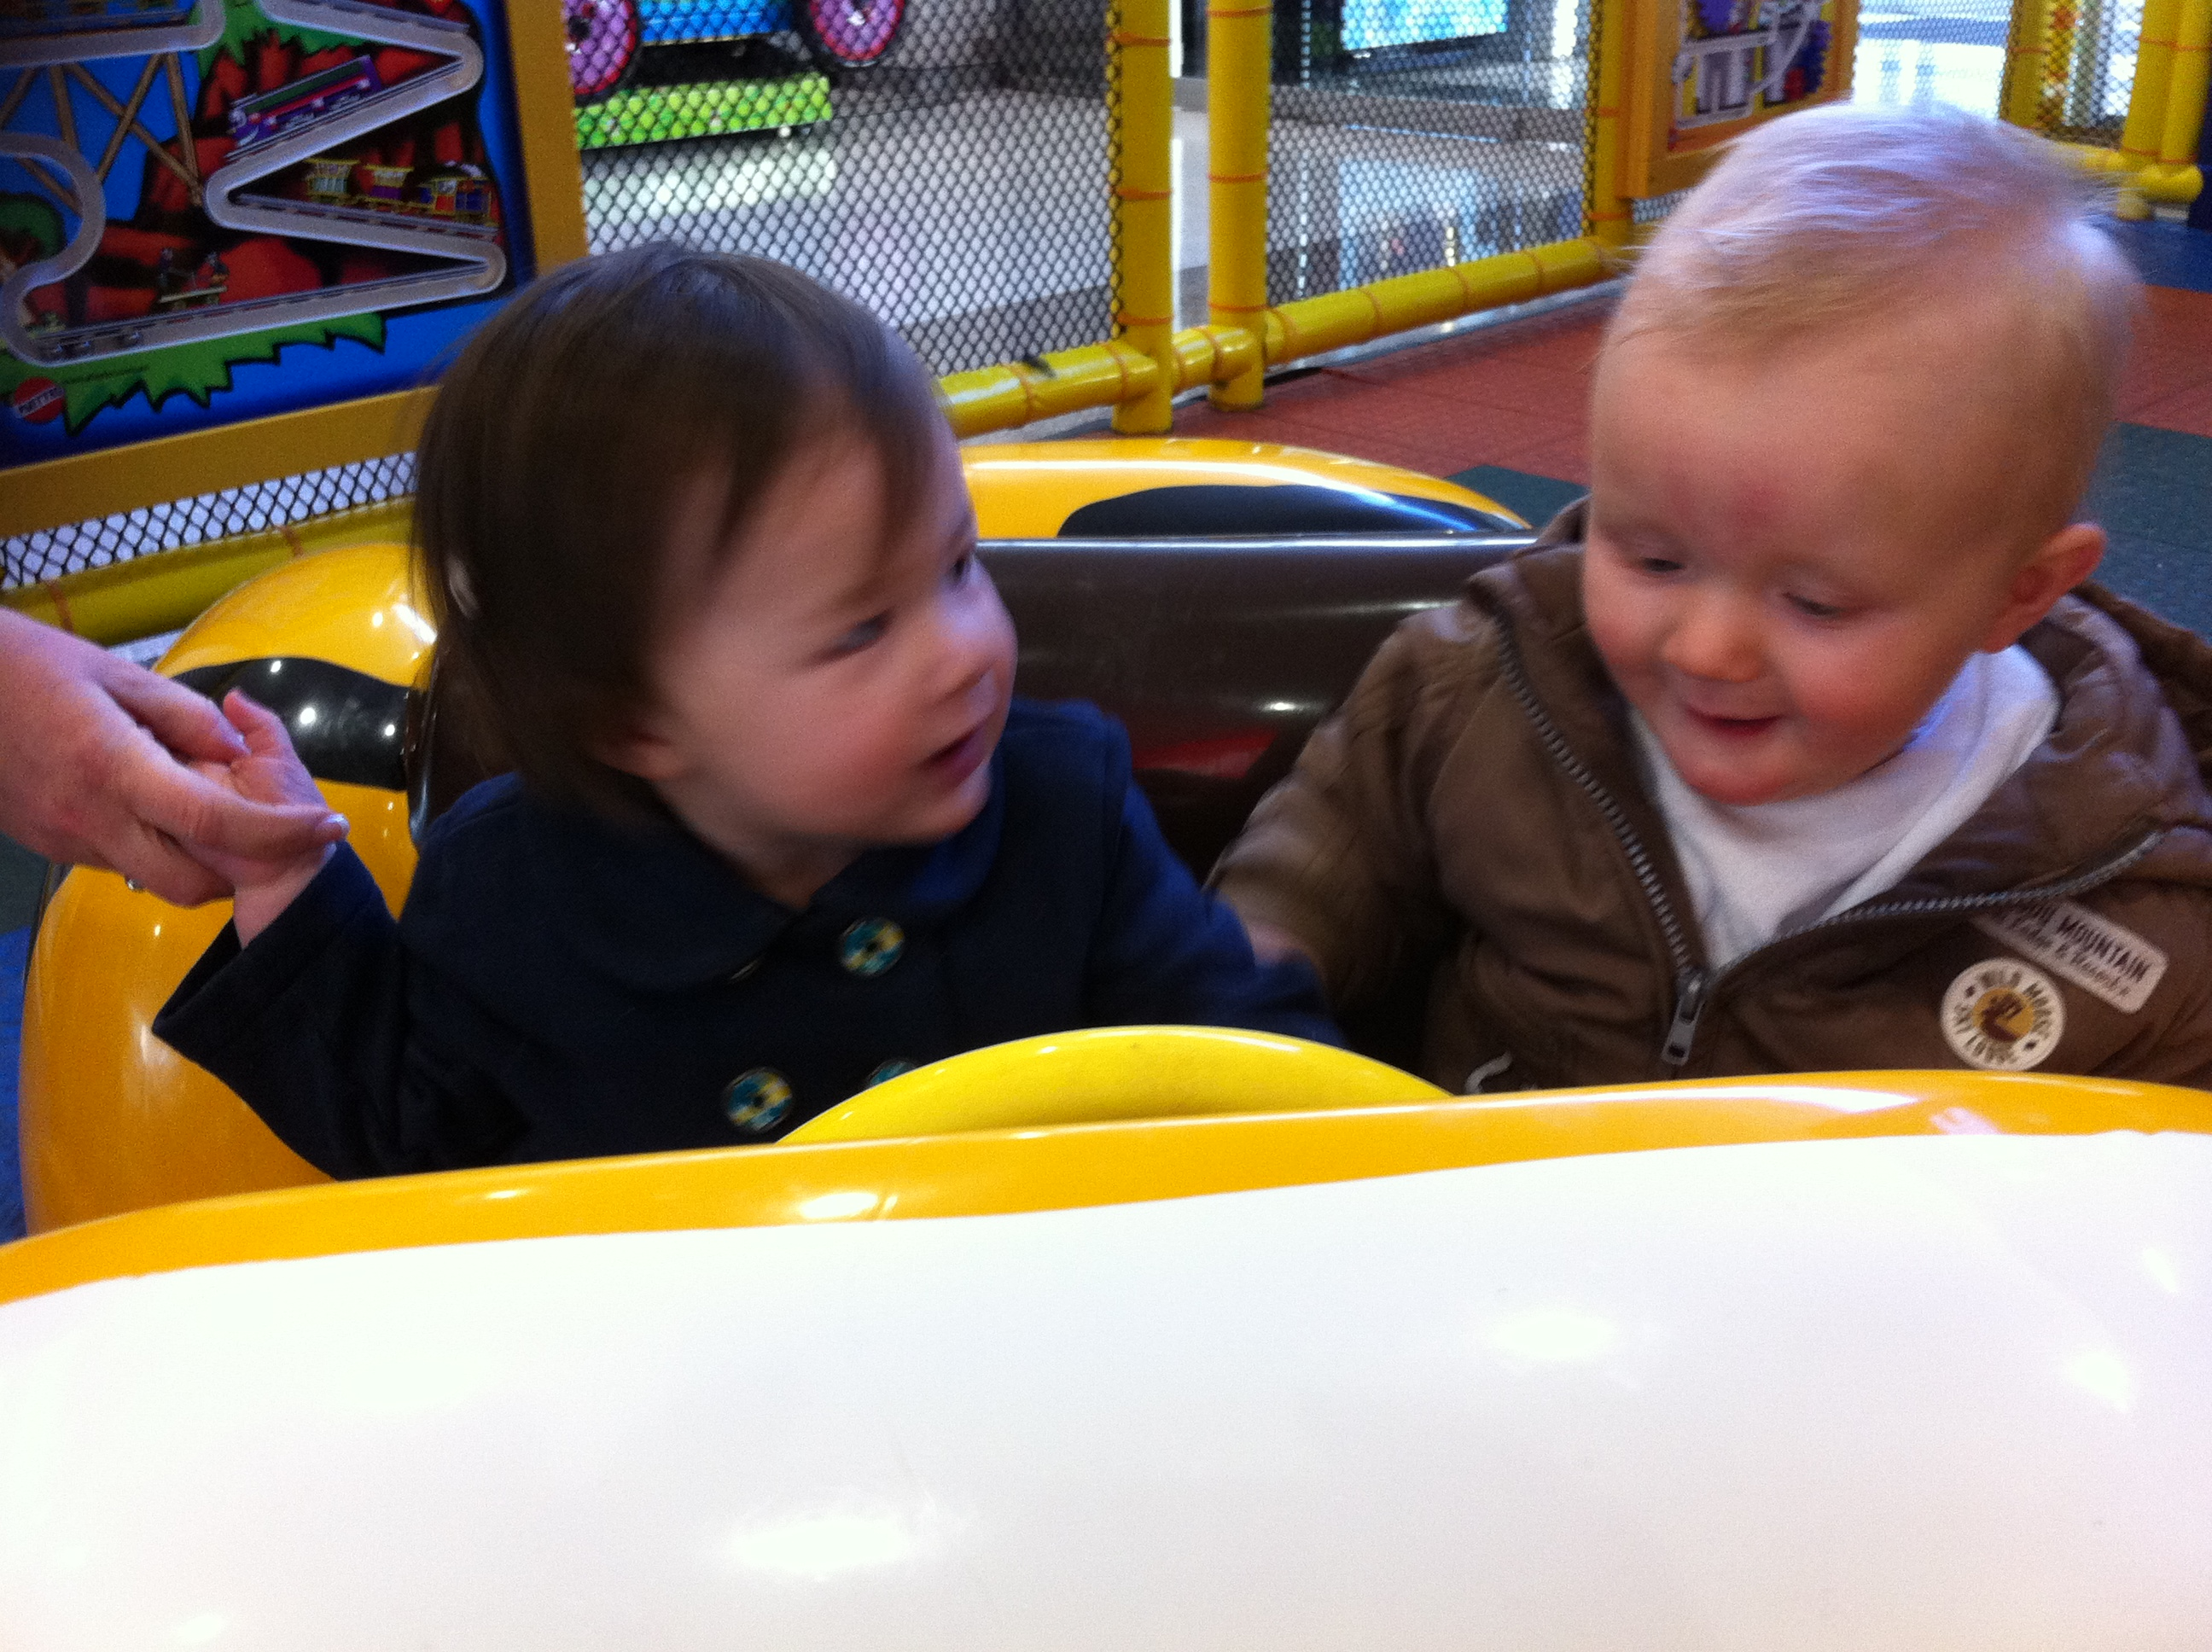 Arddun and Ryan in the bumble bee car